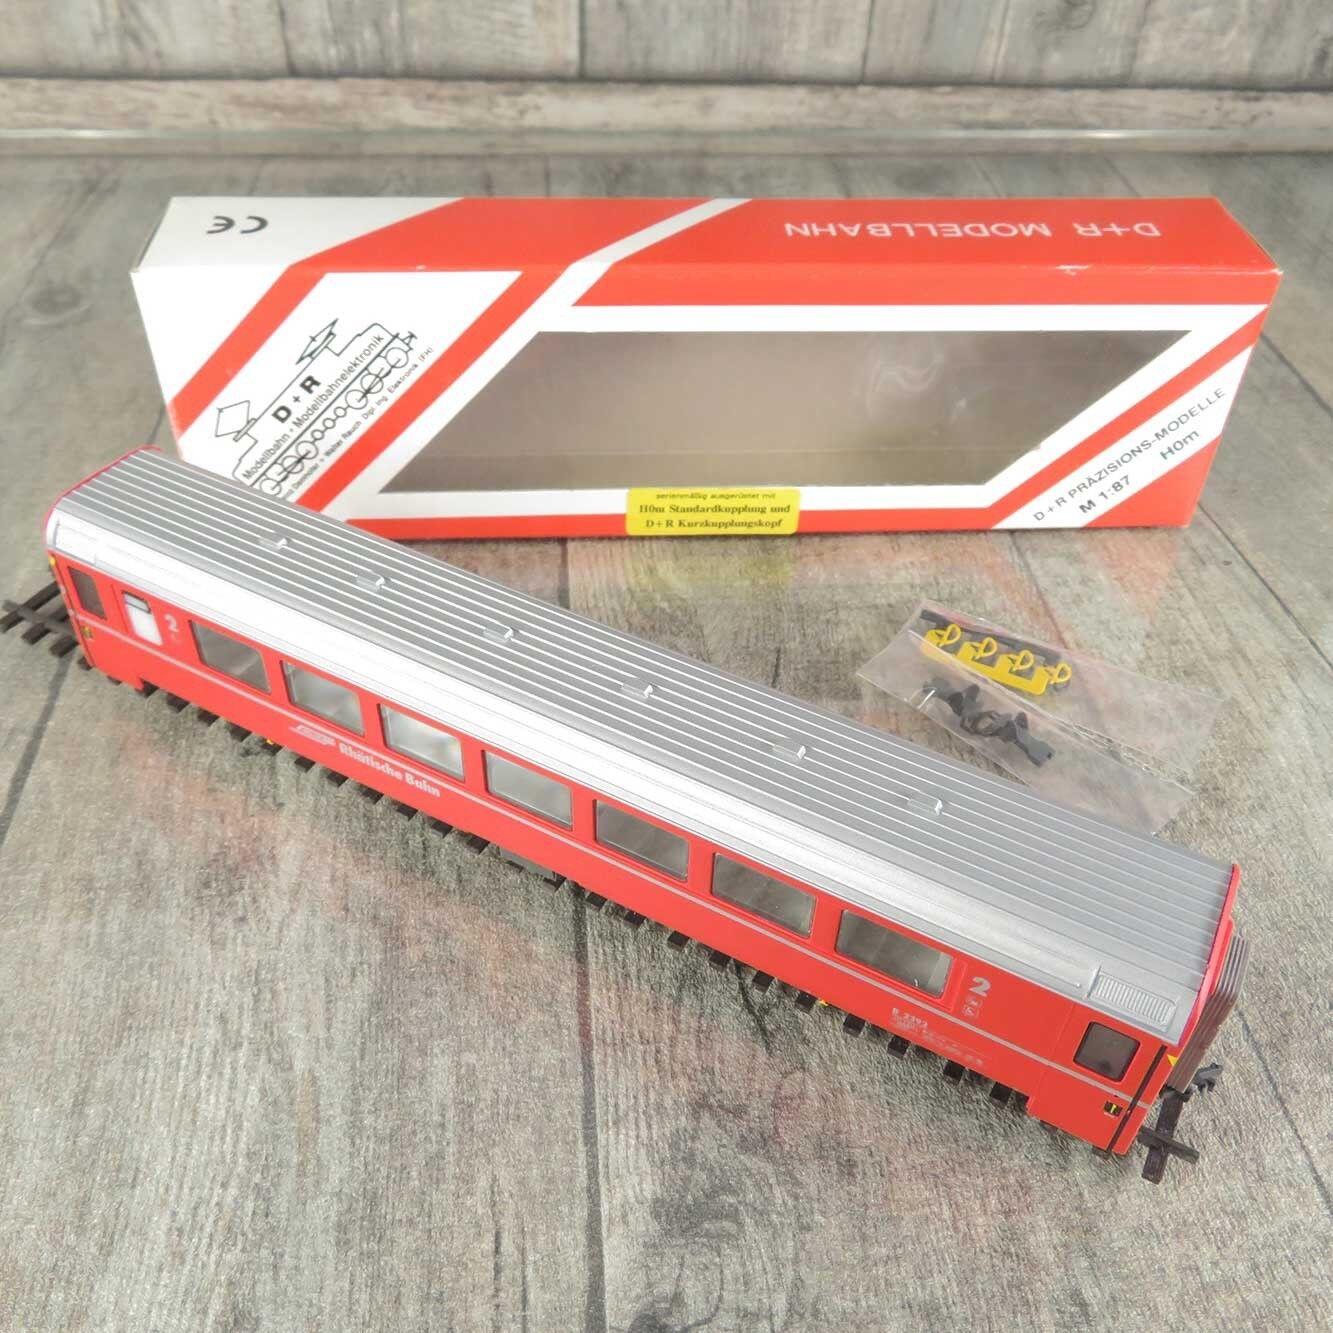 D+R Modellbahn 22392 - H0m - Personenwagen - RhB - 2.Kl. - OVP -  K15532